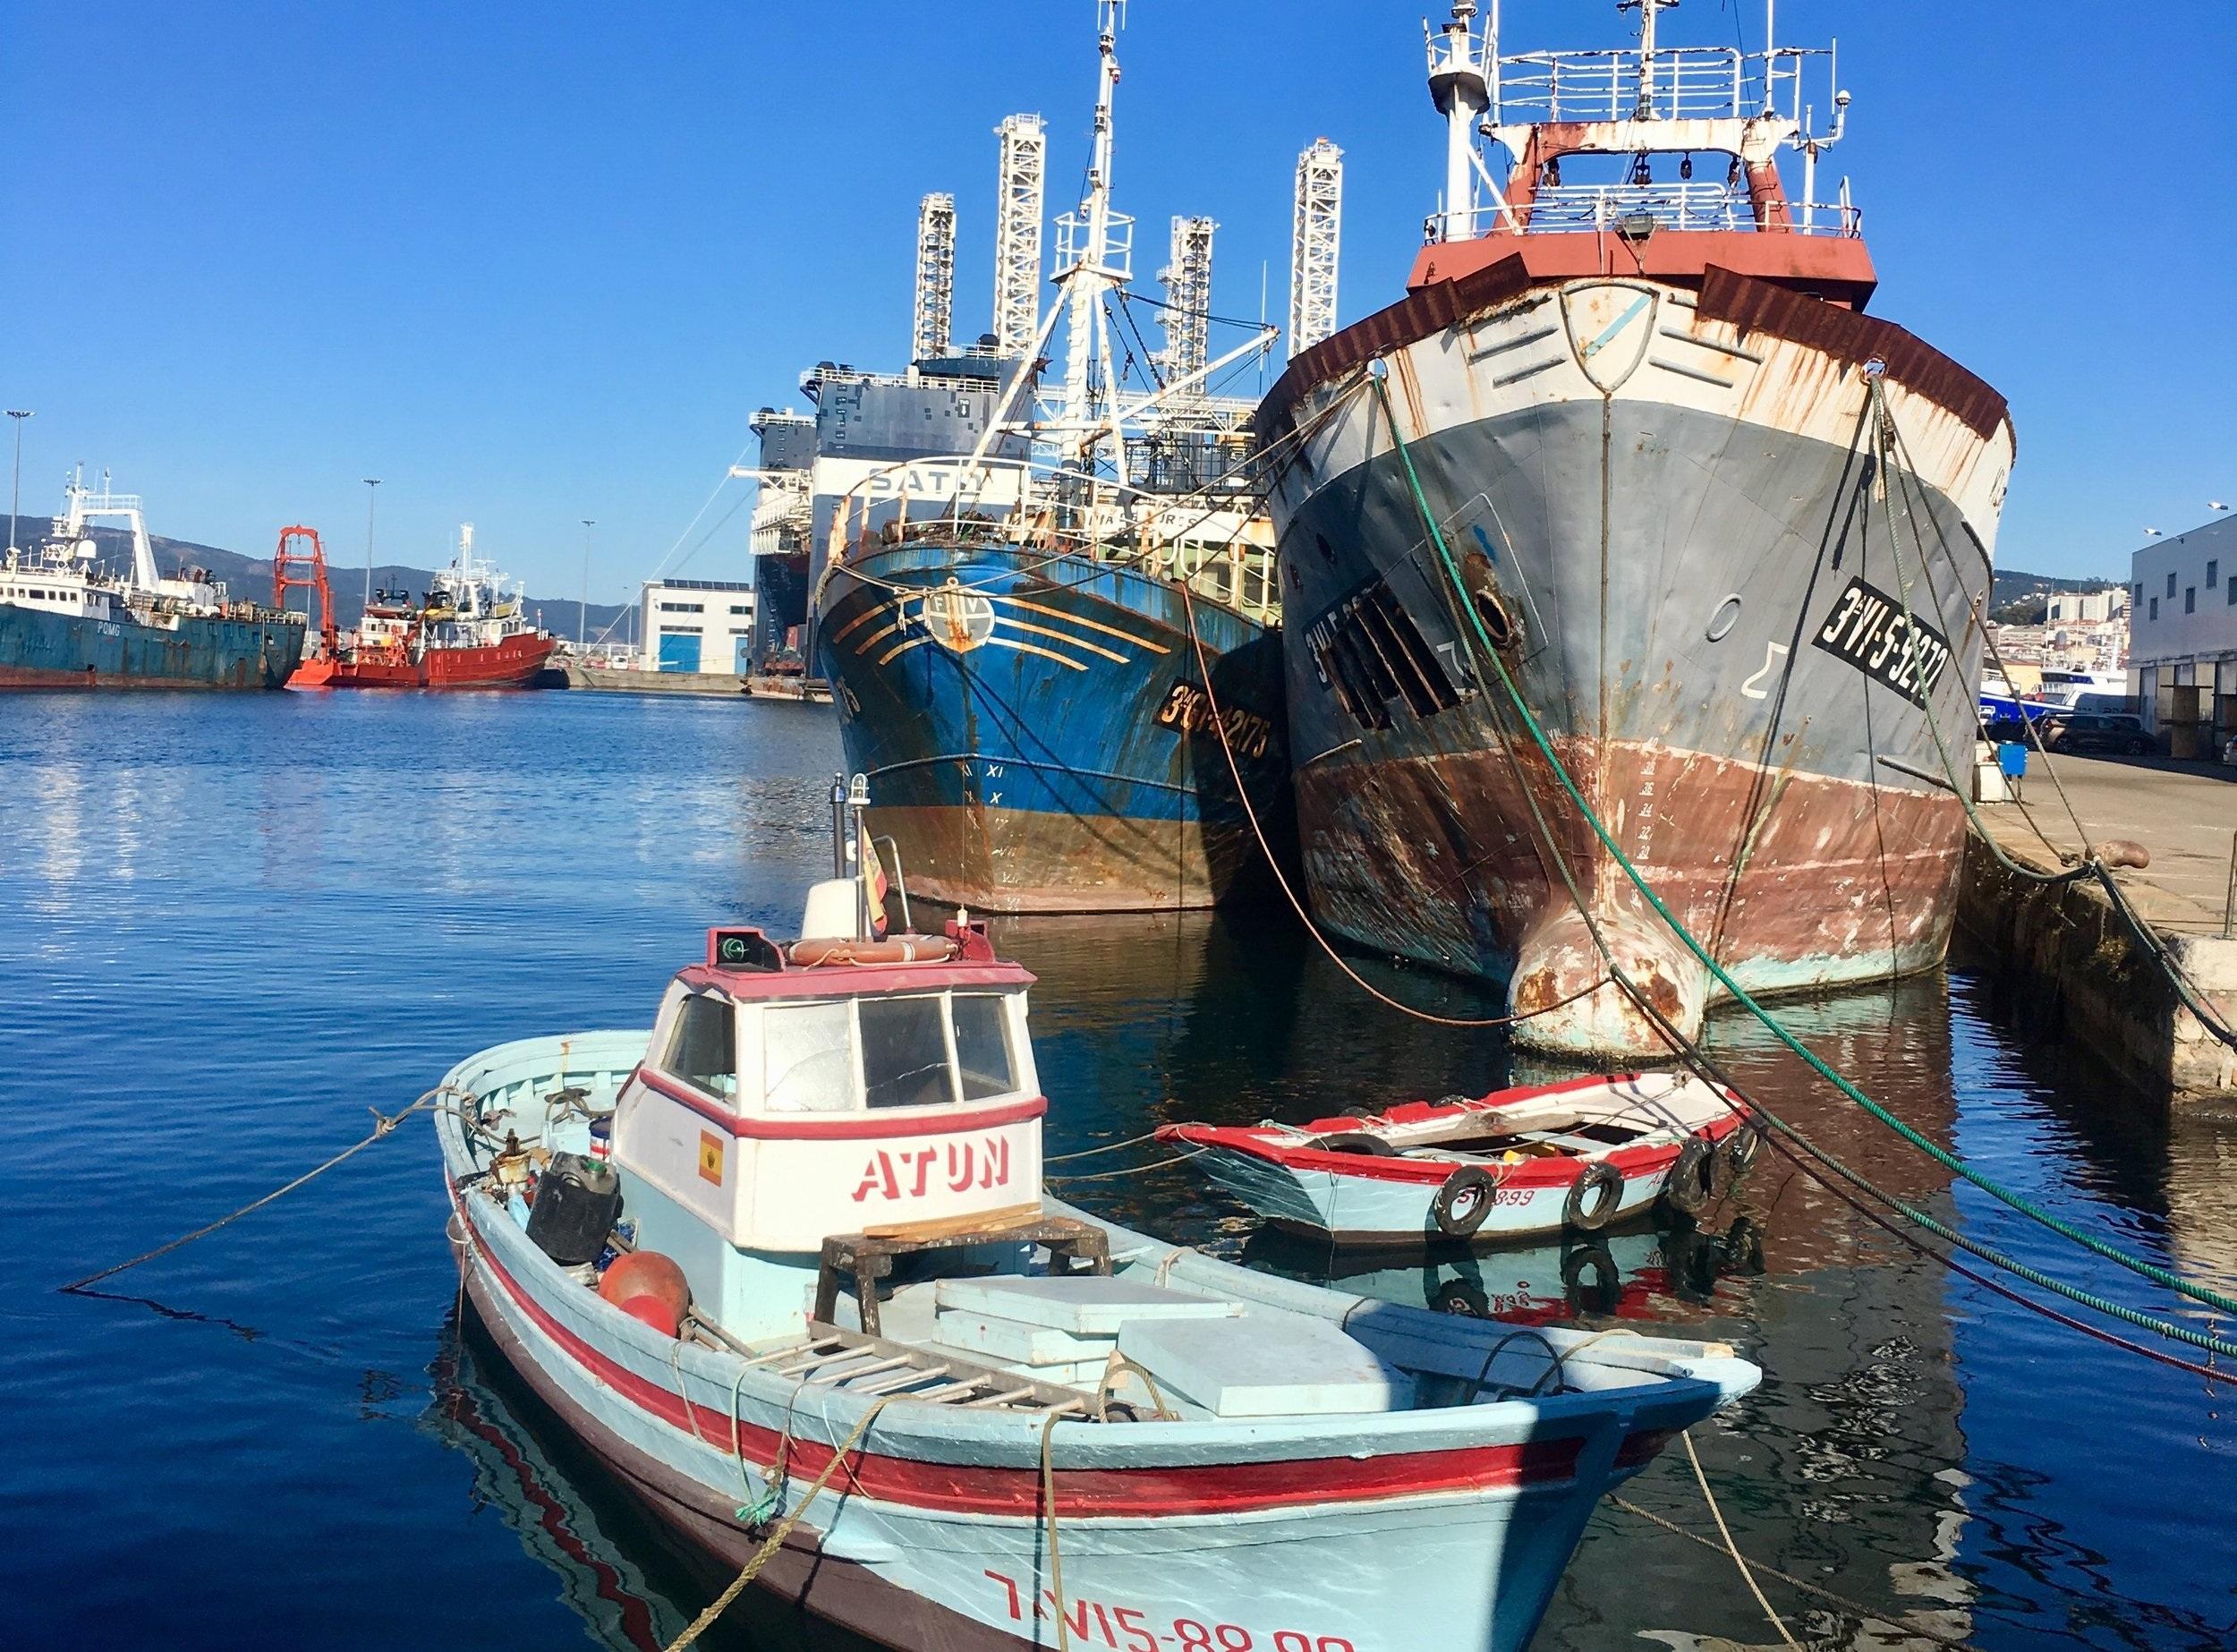 Vigo, Spain - SPANISH ATLANTIC COASTCLICK HERE